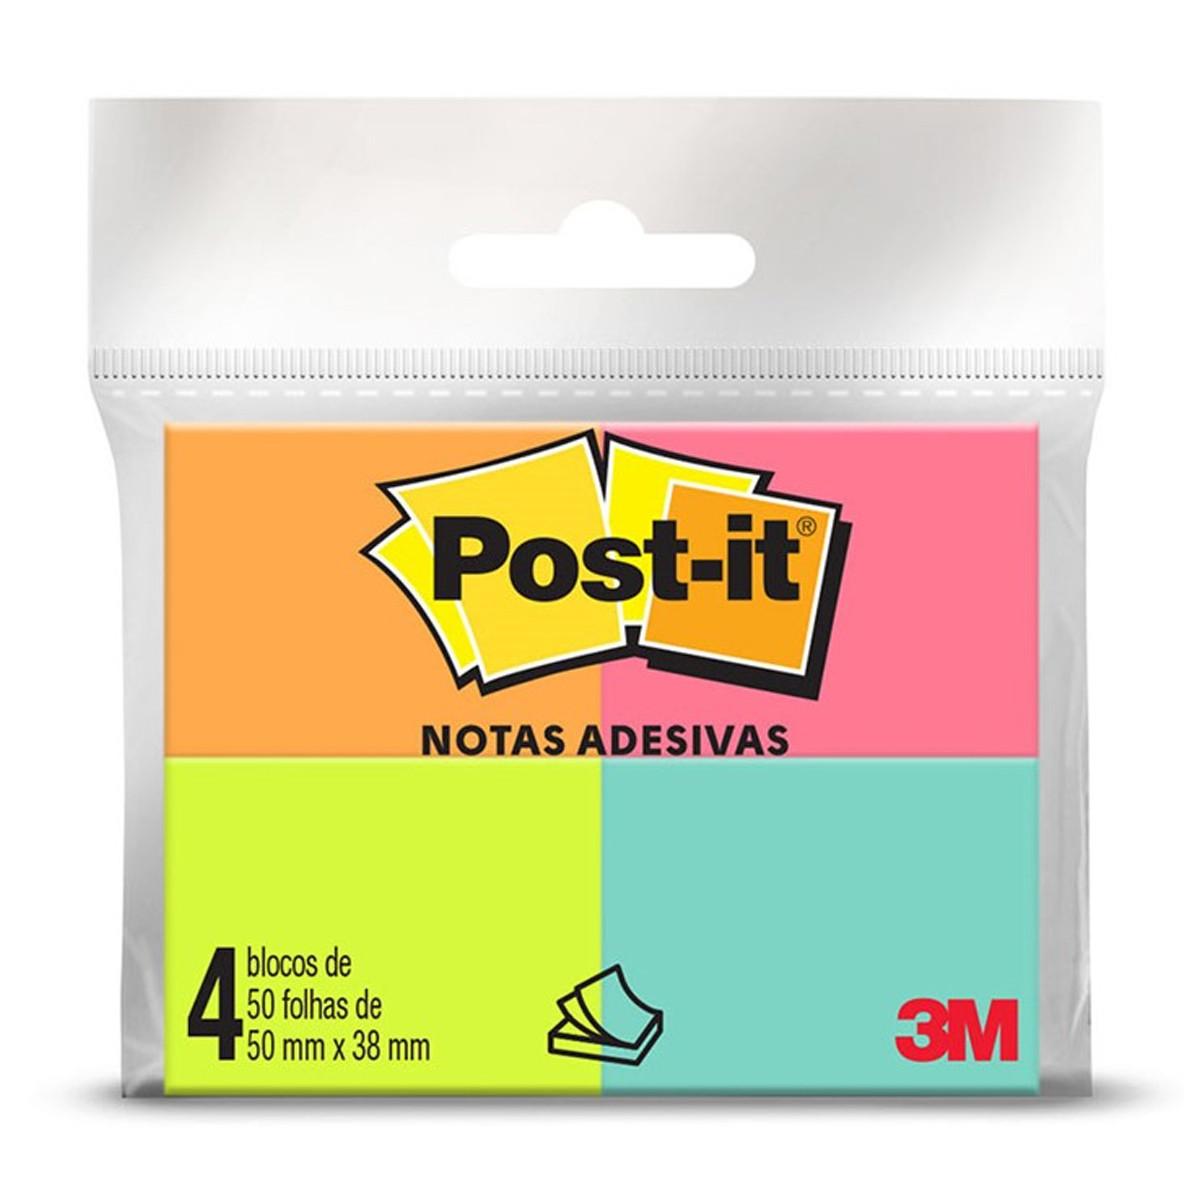 POST-IT 4 BLOCOS 38X50 C/ 50 FLS VERDE, ROSA,AMARELO,LARANJA